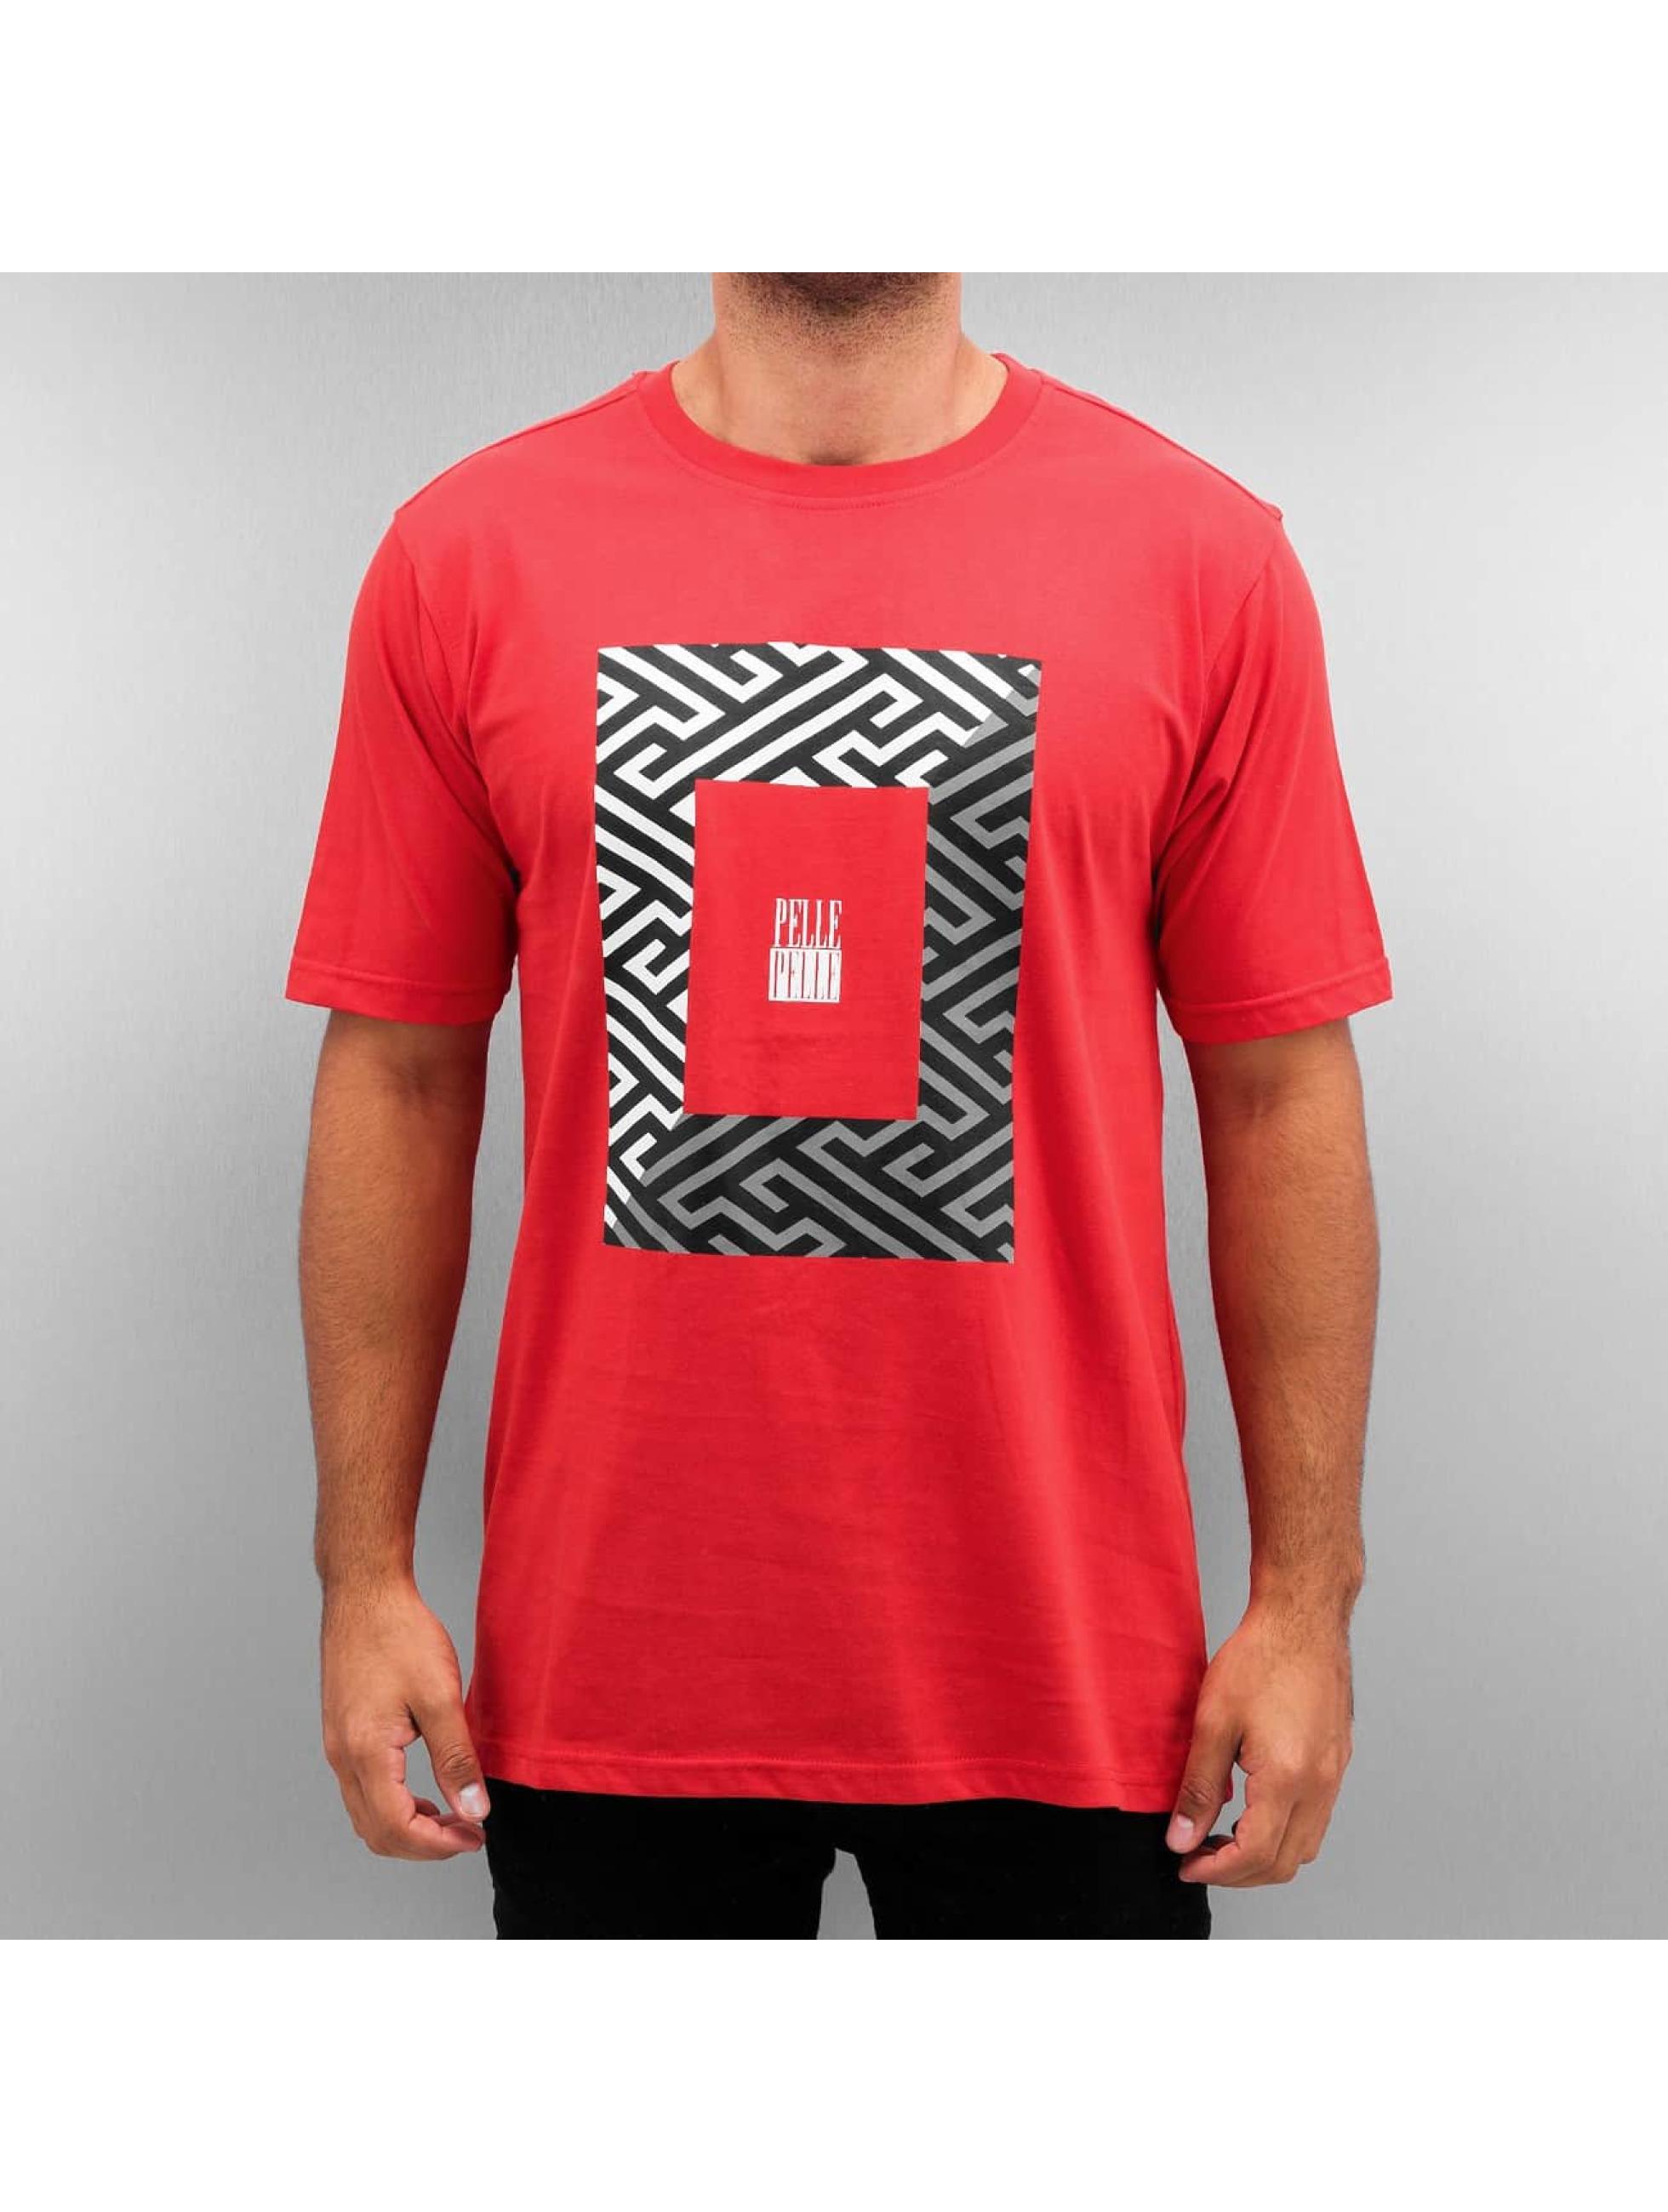 Pelle Pelle Футболка 50/50 Dark Maze красный